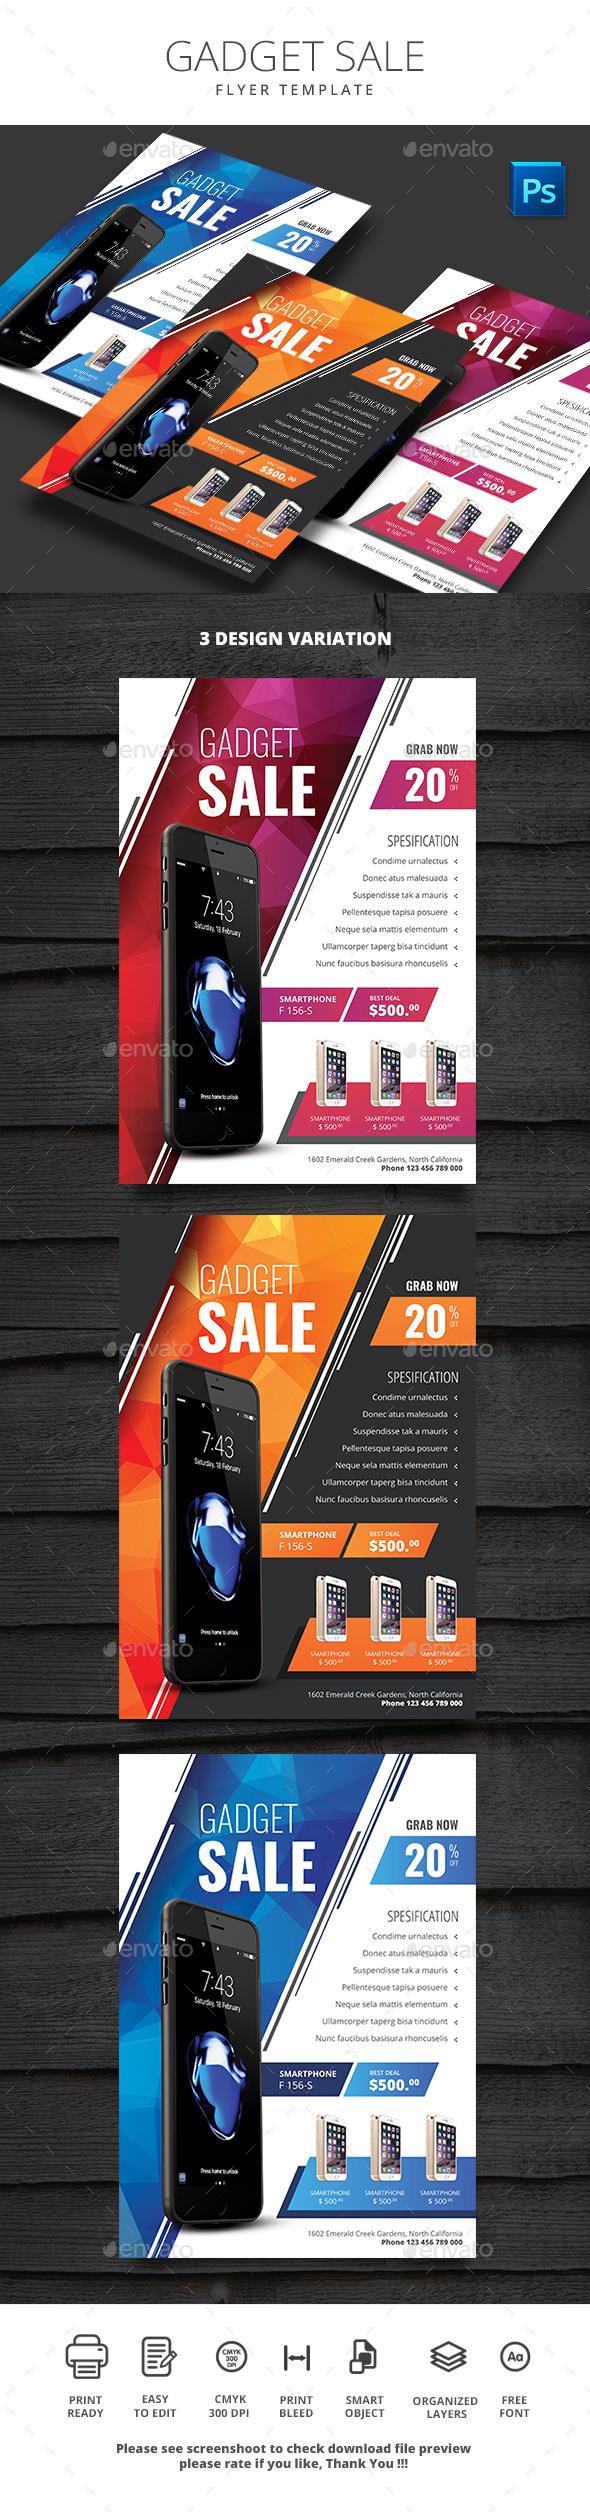 Gadget Sale - Events Flyers